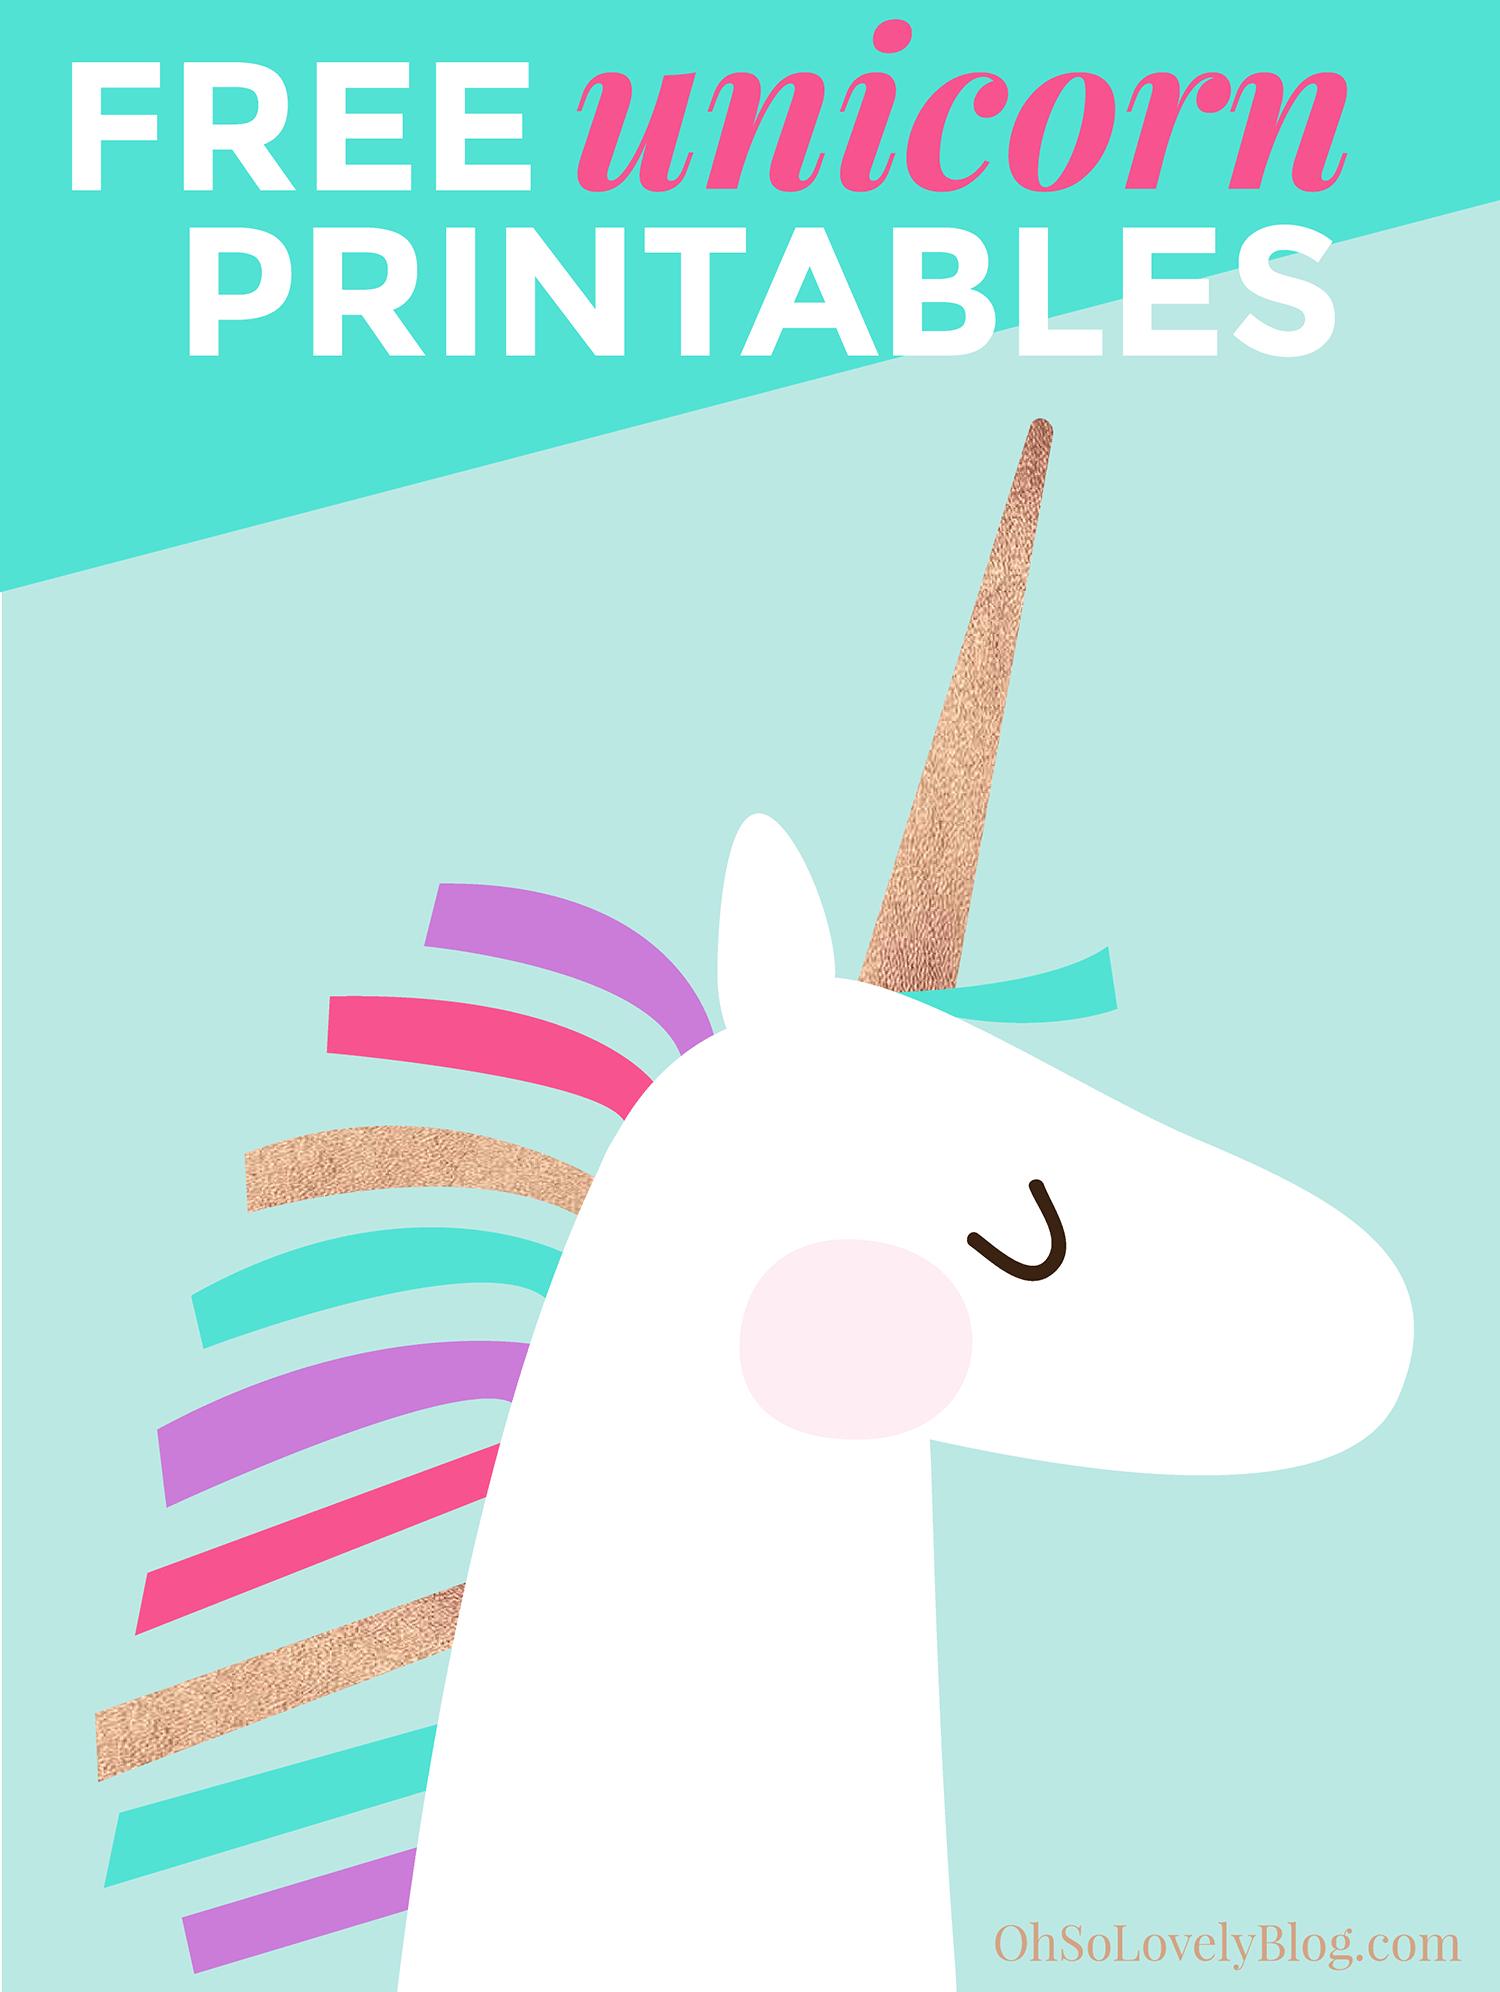 Diy Toddler Bedroom Progress | Printables | Pinterest | Unicorn - Unicorn Name Free Printable